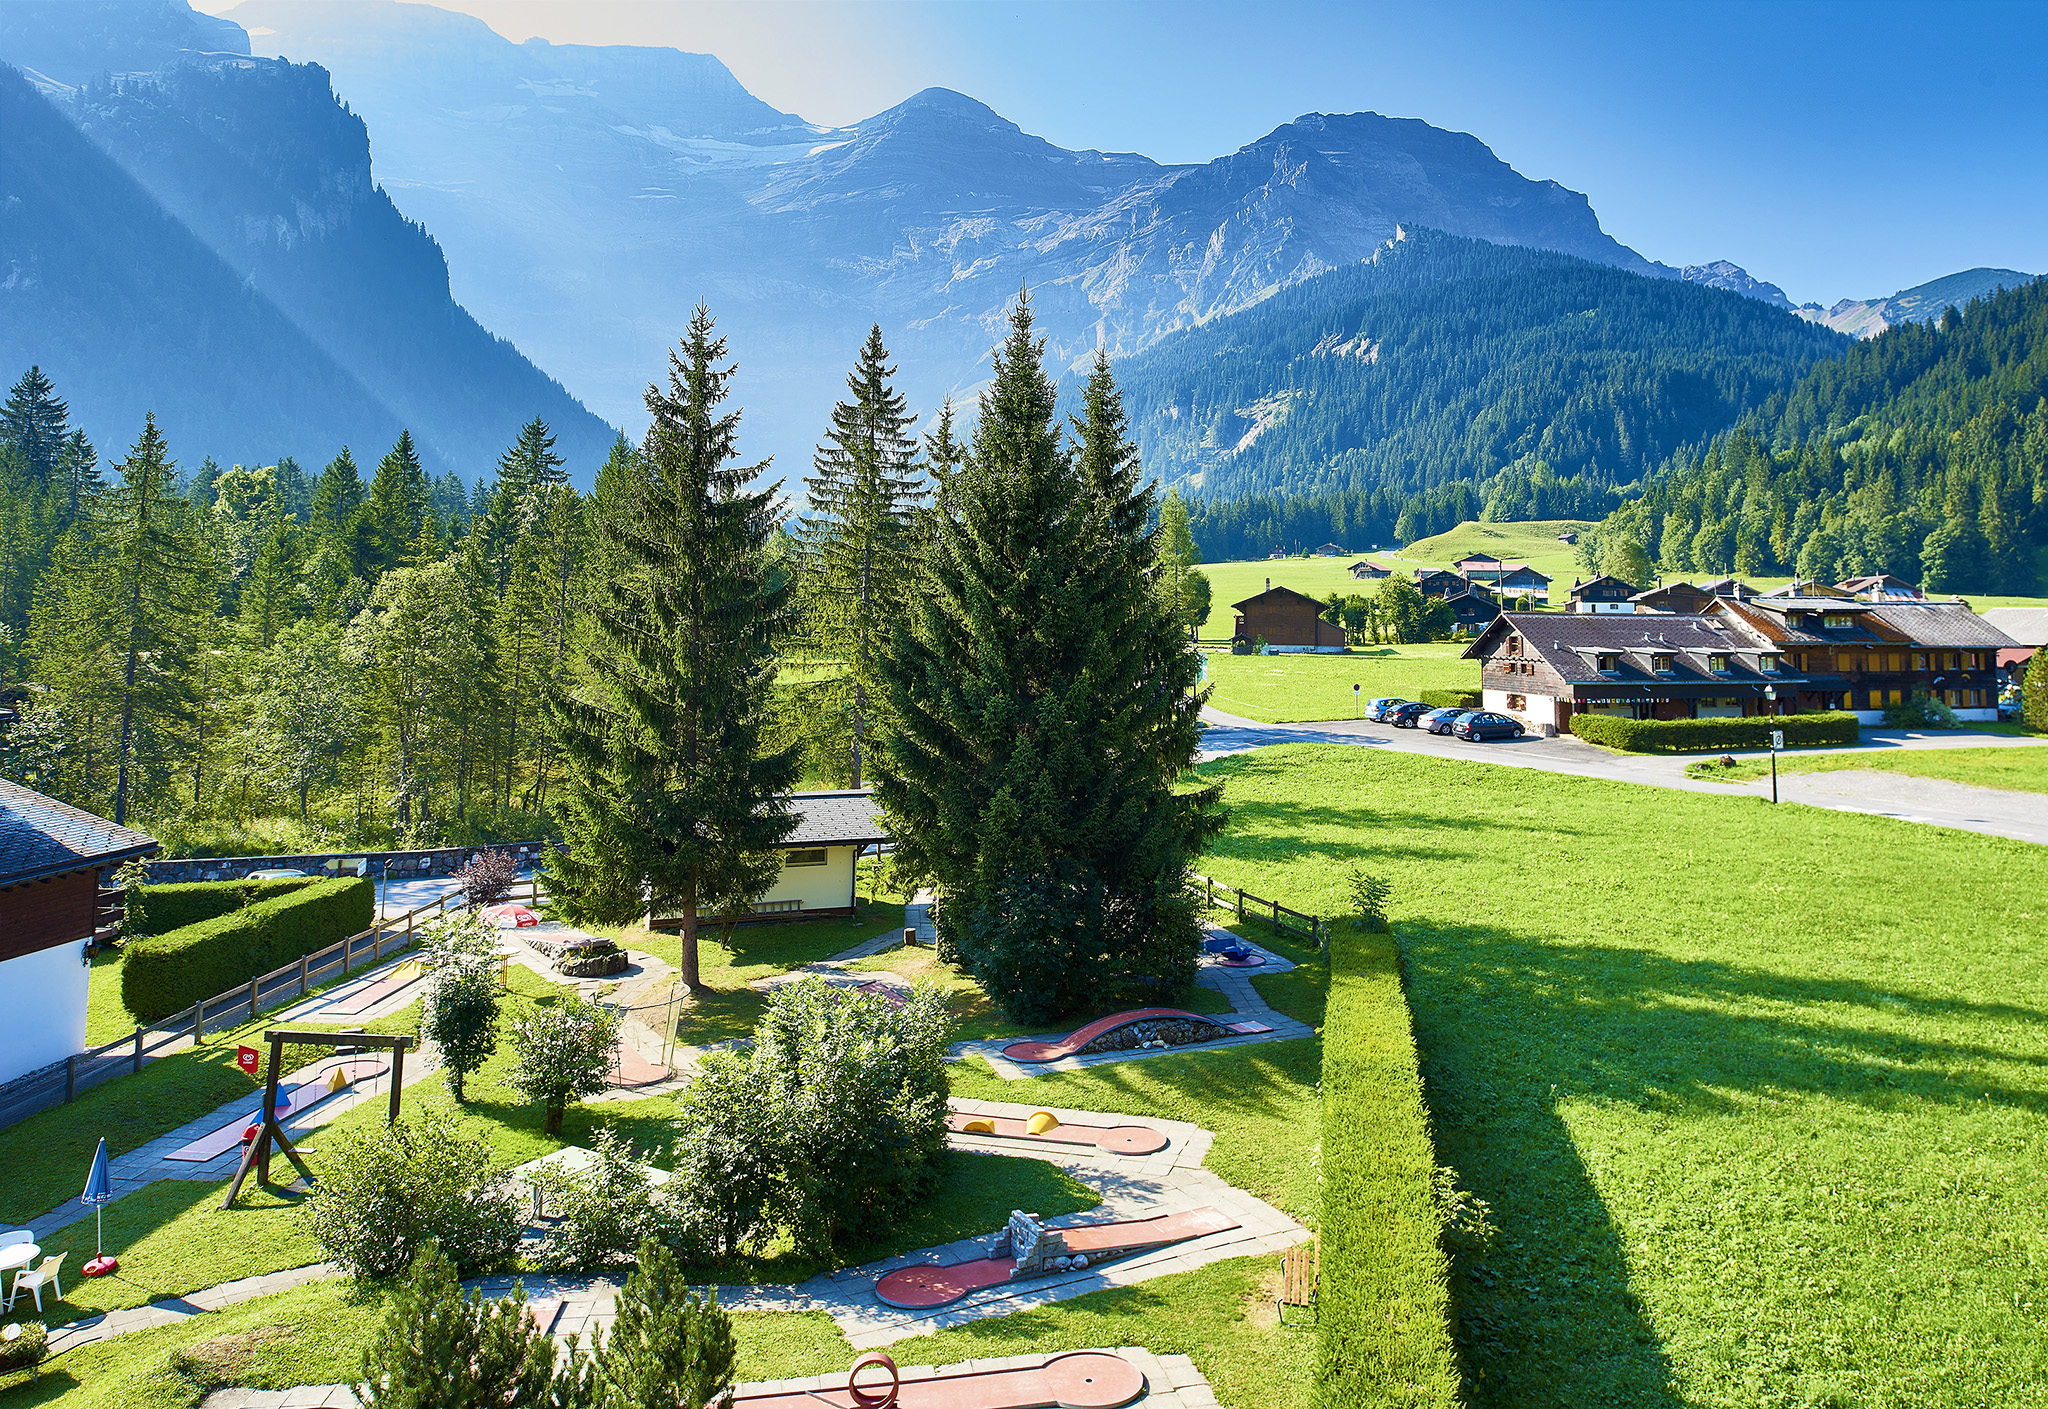 kt_2020_320_Keytours_excursions_Swisstours_glacier3000_village1_2048_10